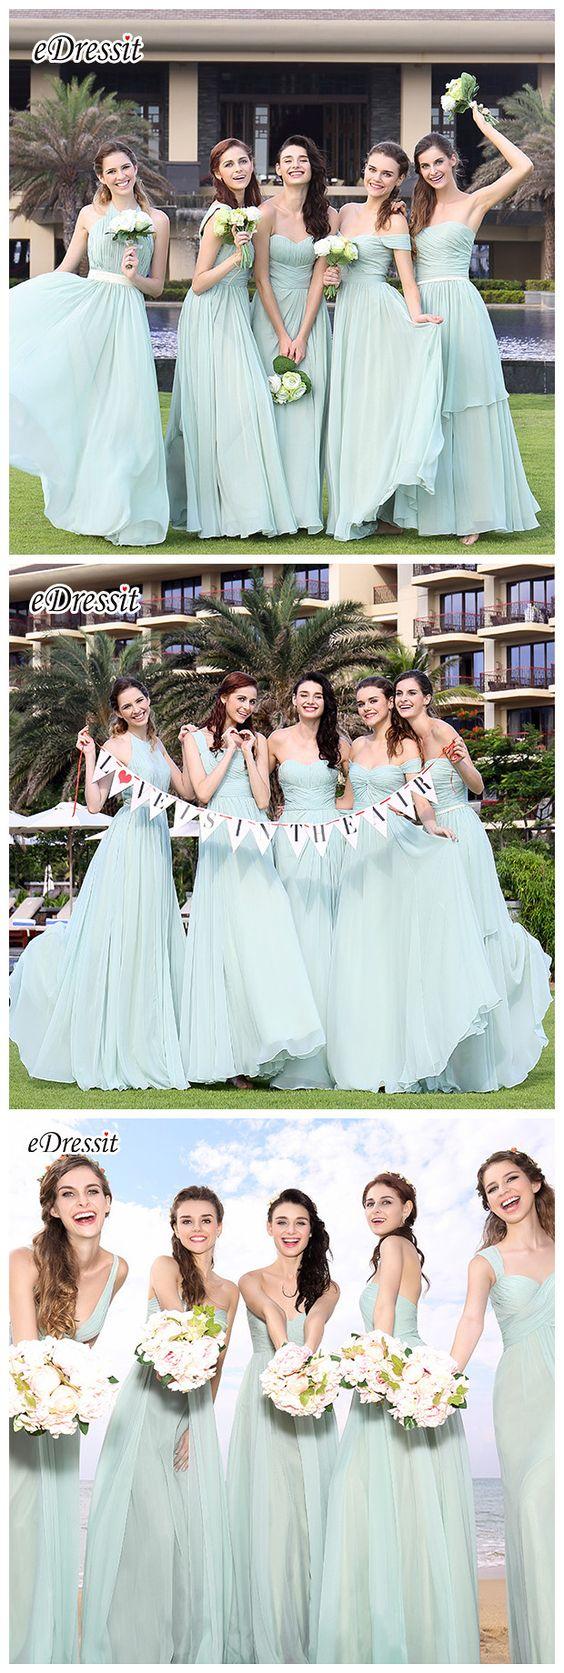 Mint bridesmaid dresses from eDressit! #bridesmaids #mint #wedding